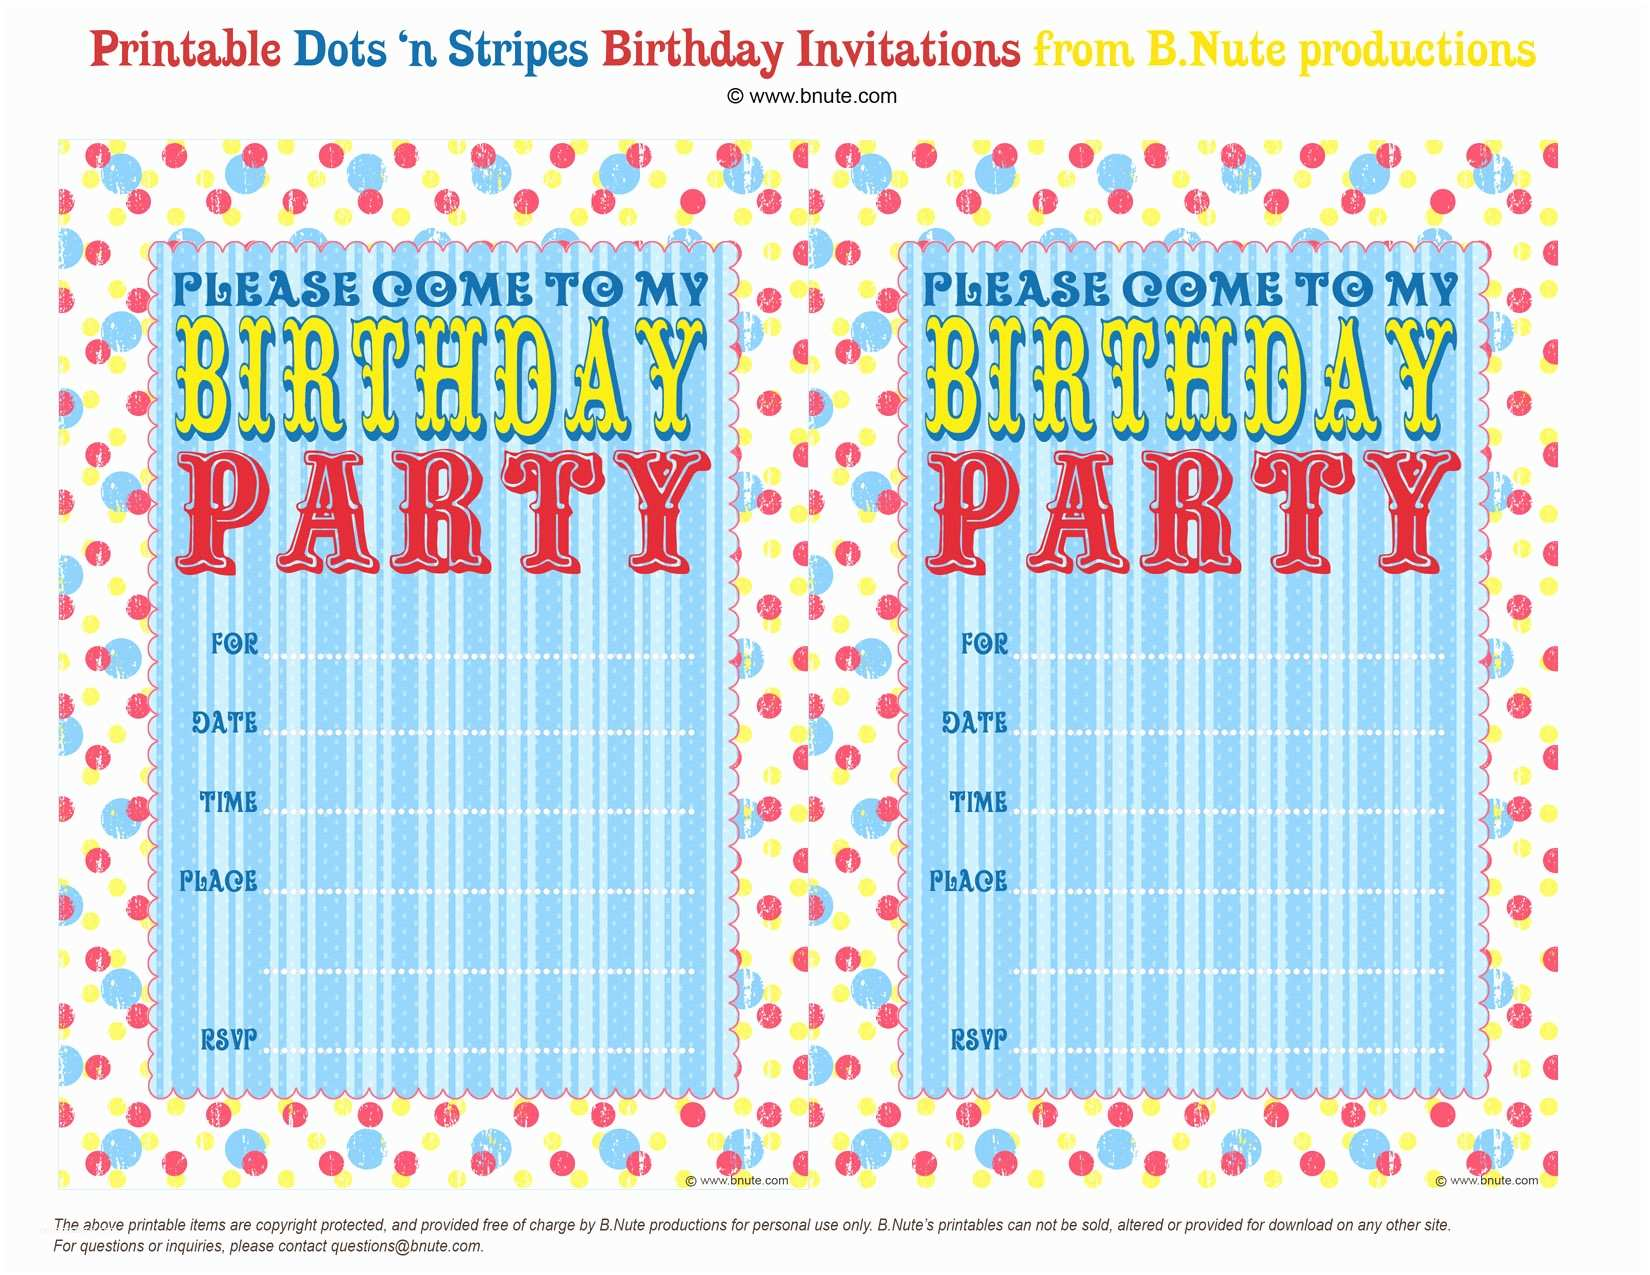 Free Birthday Party Invitations Free Printable Birthday Party Invitations